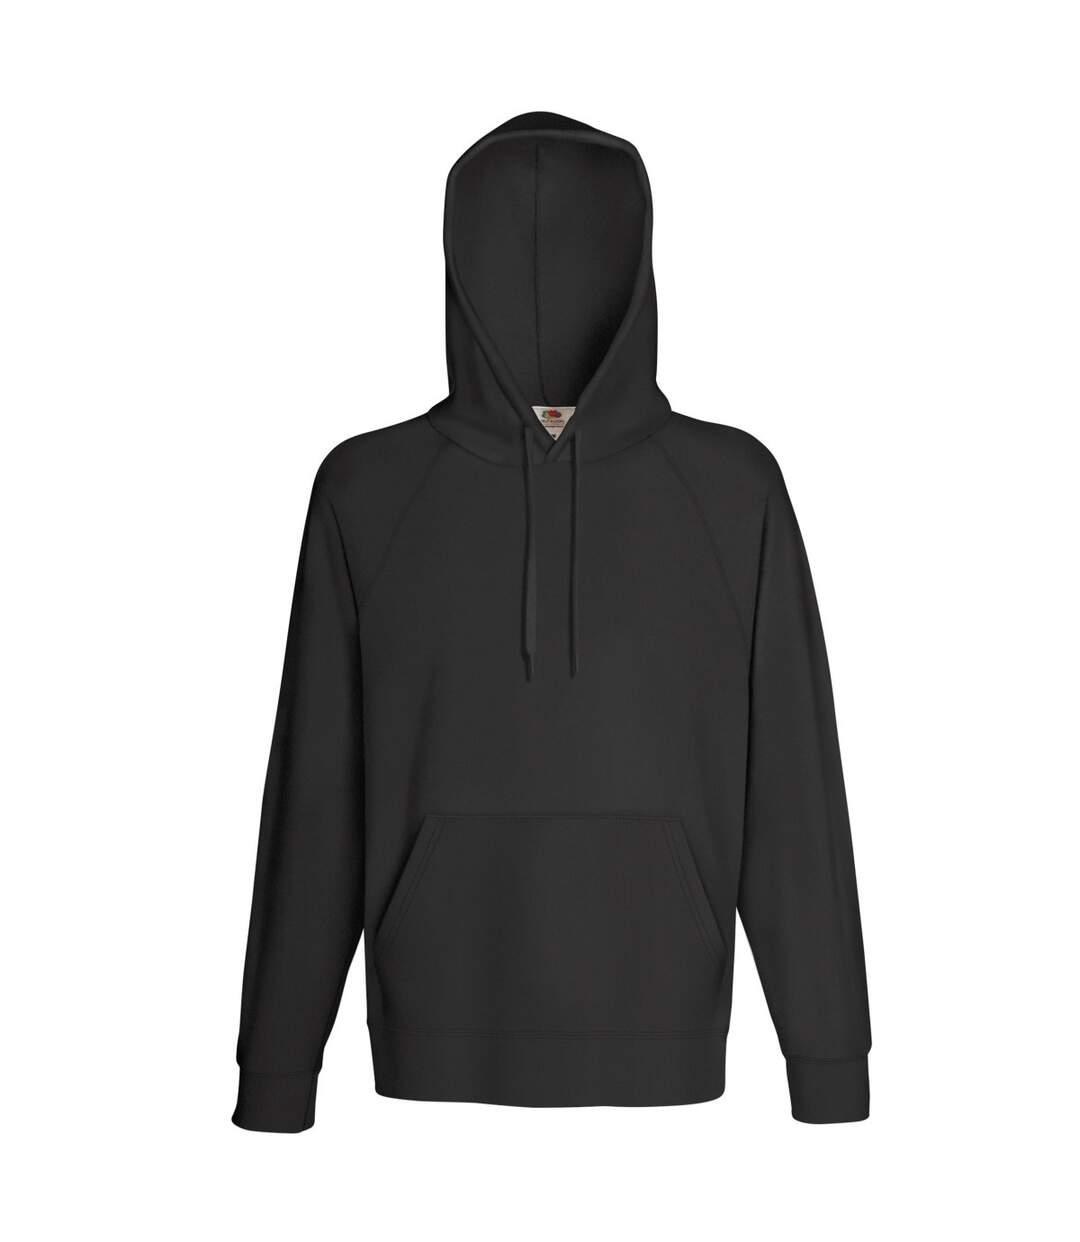 Fruit Of The Loom Mens Lightweight Hooded Sweatshirt / Hoodie (240 GSM) (Light Graphite) - UTBC2654